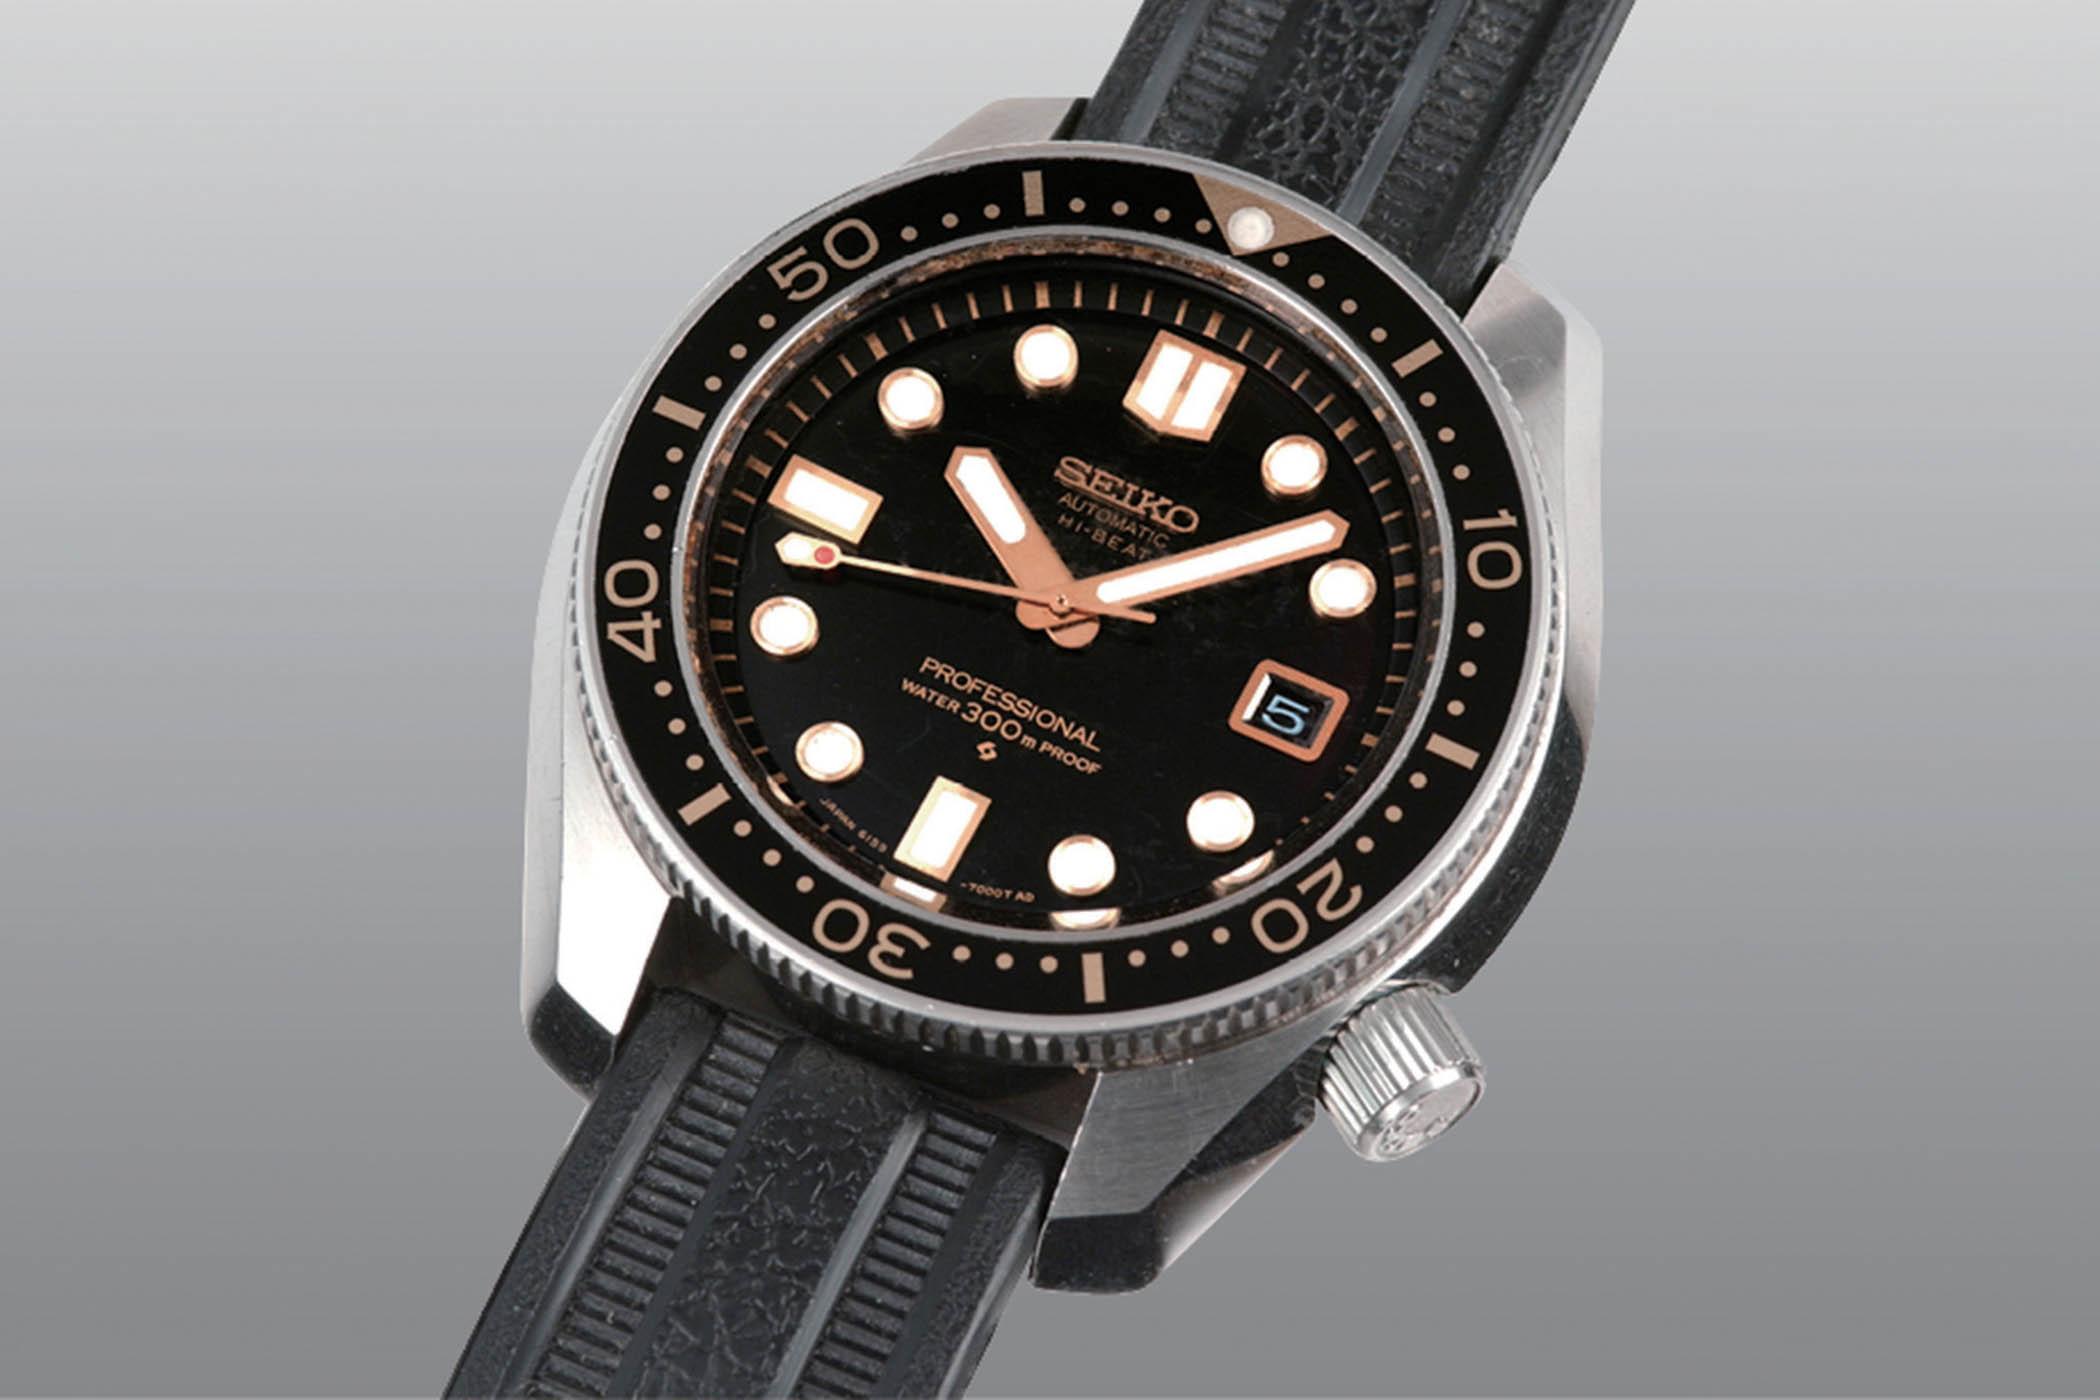 1968-Seiko-Diver-300m-hi-beat-6159-7001.